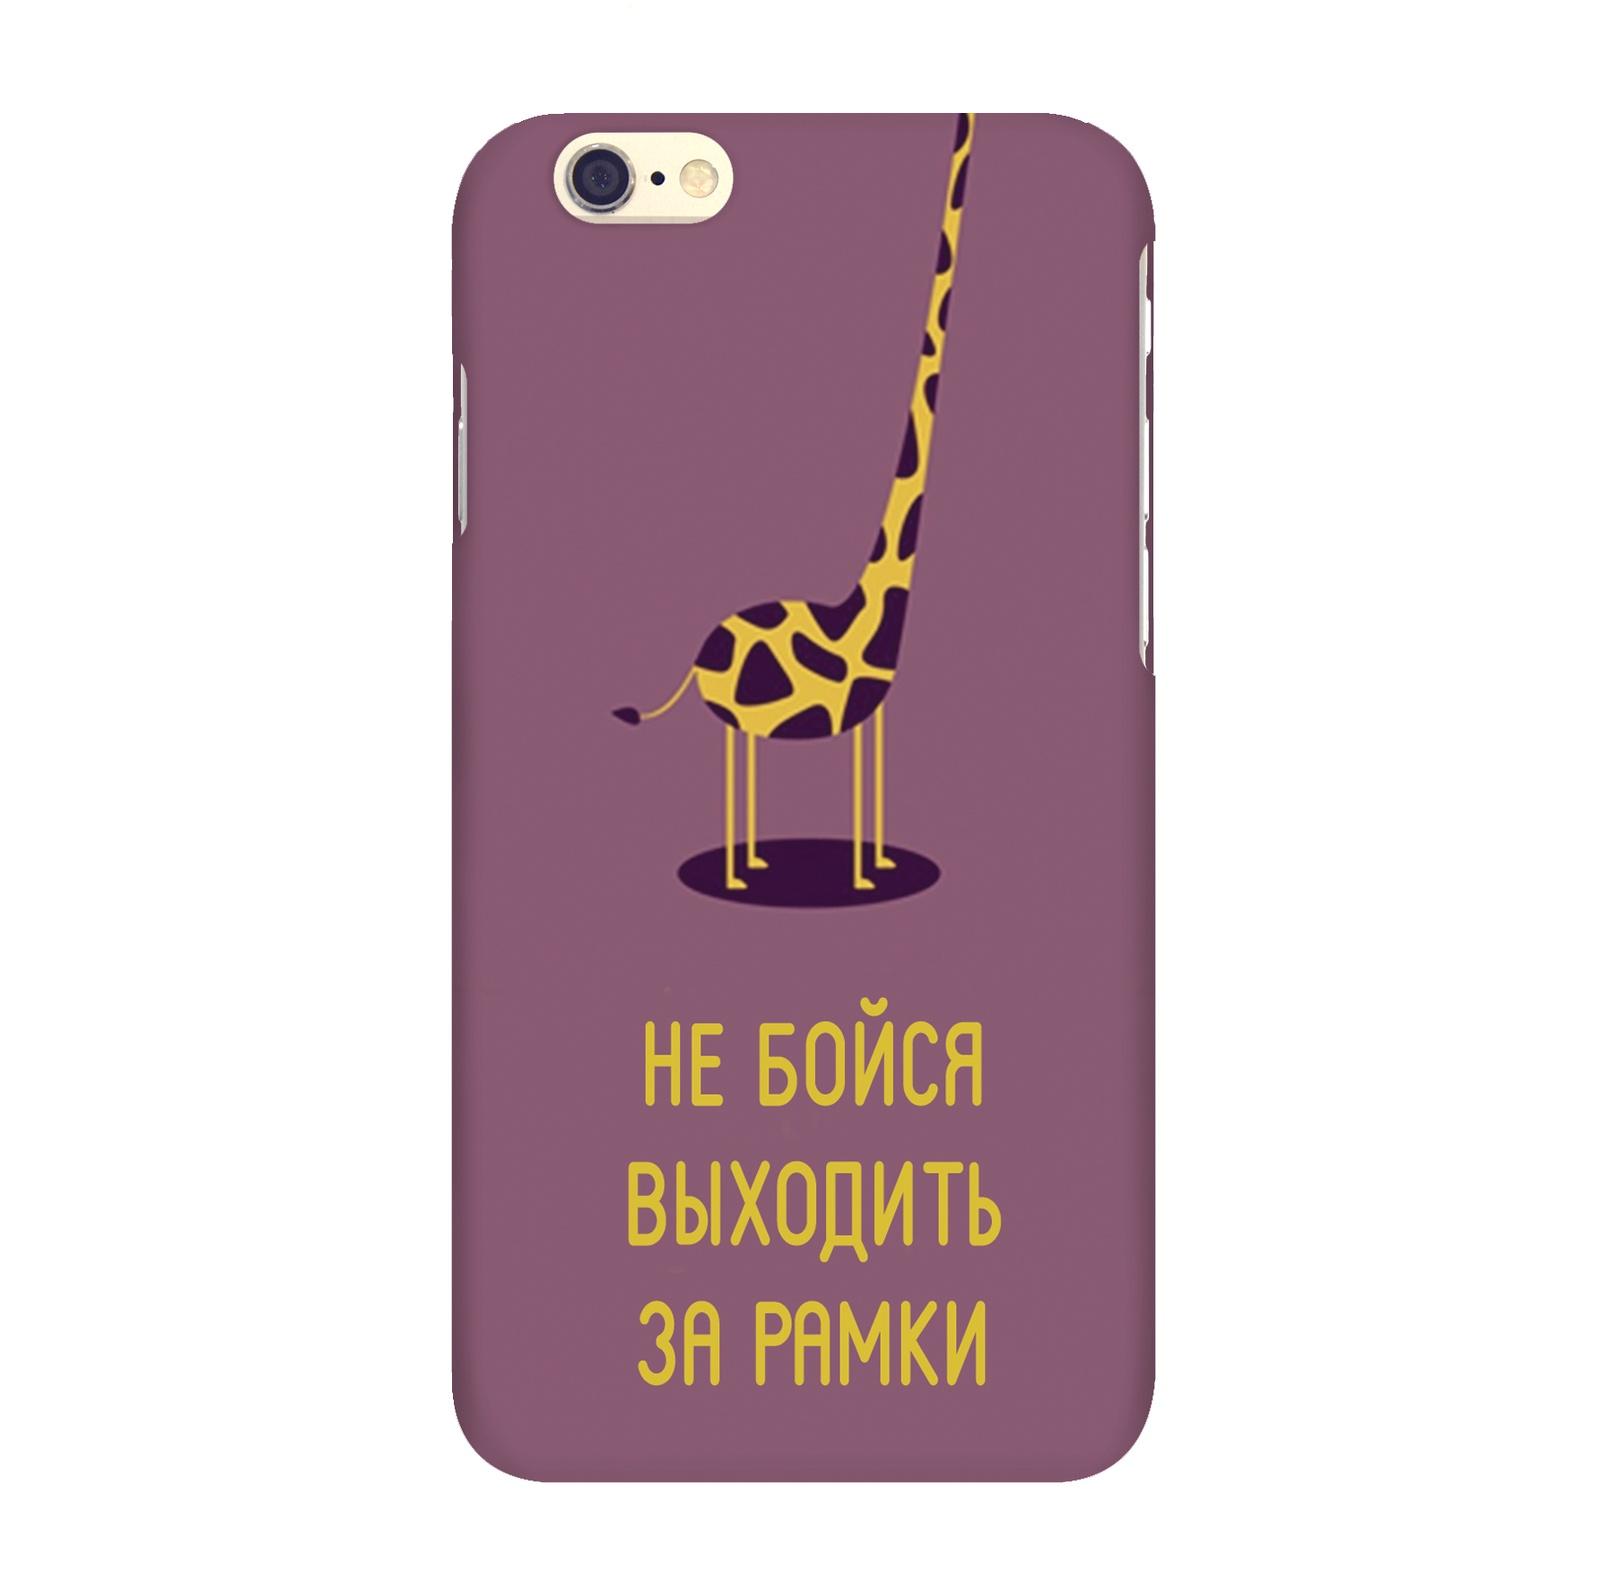 цена Чехол для сотового телефона Mitya Veselkov IP6.MITYA, IP6.MITYA-260 онлайн в 2017 году